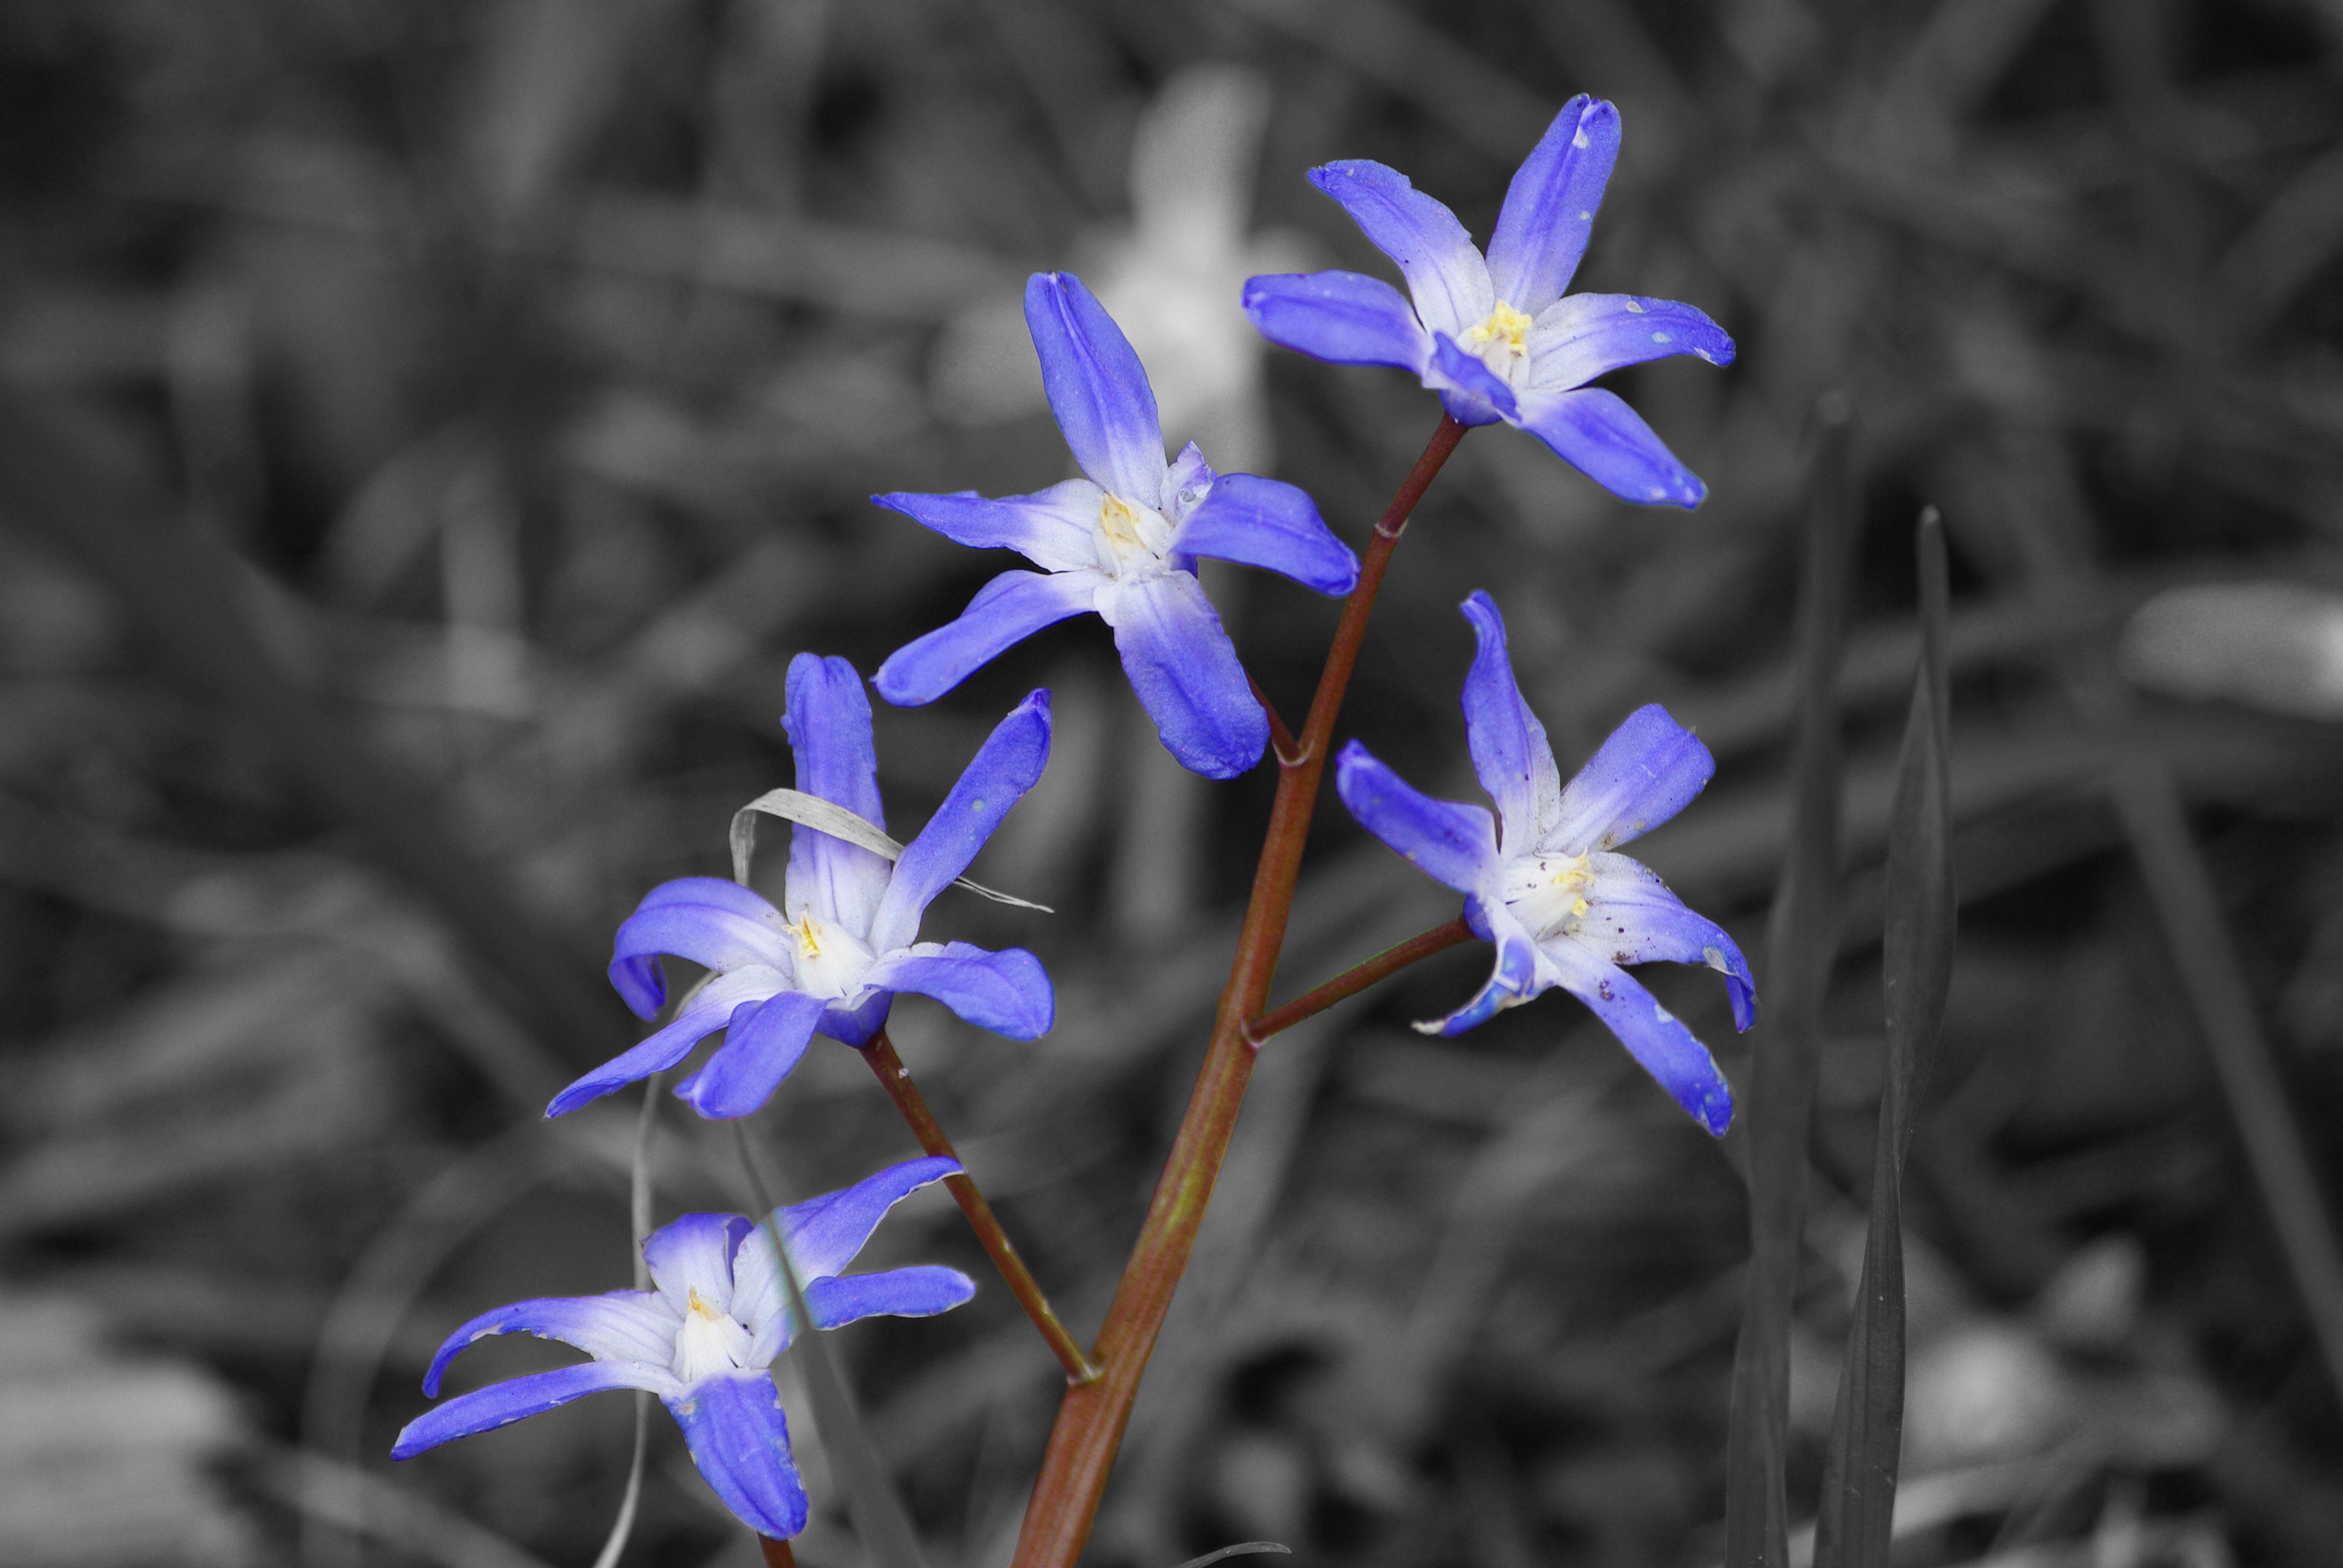 purplestems